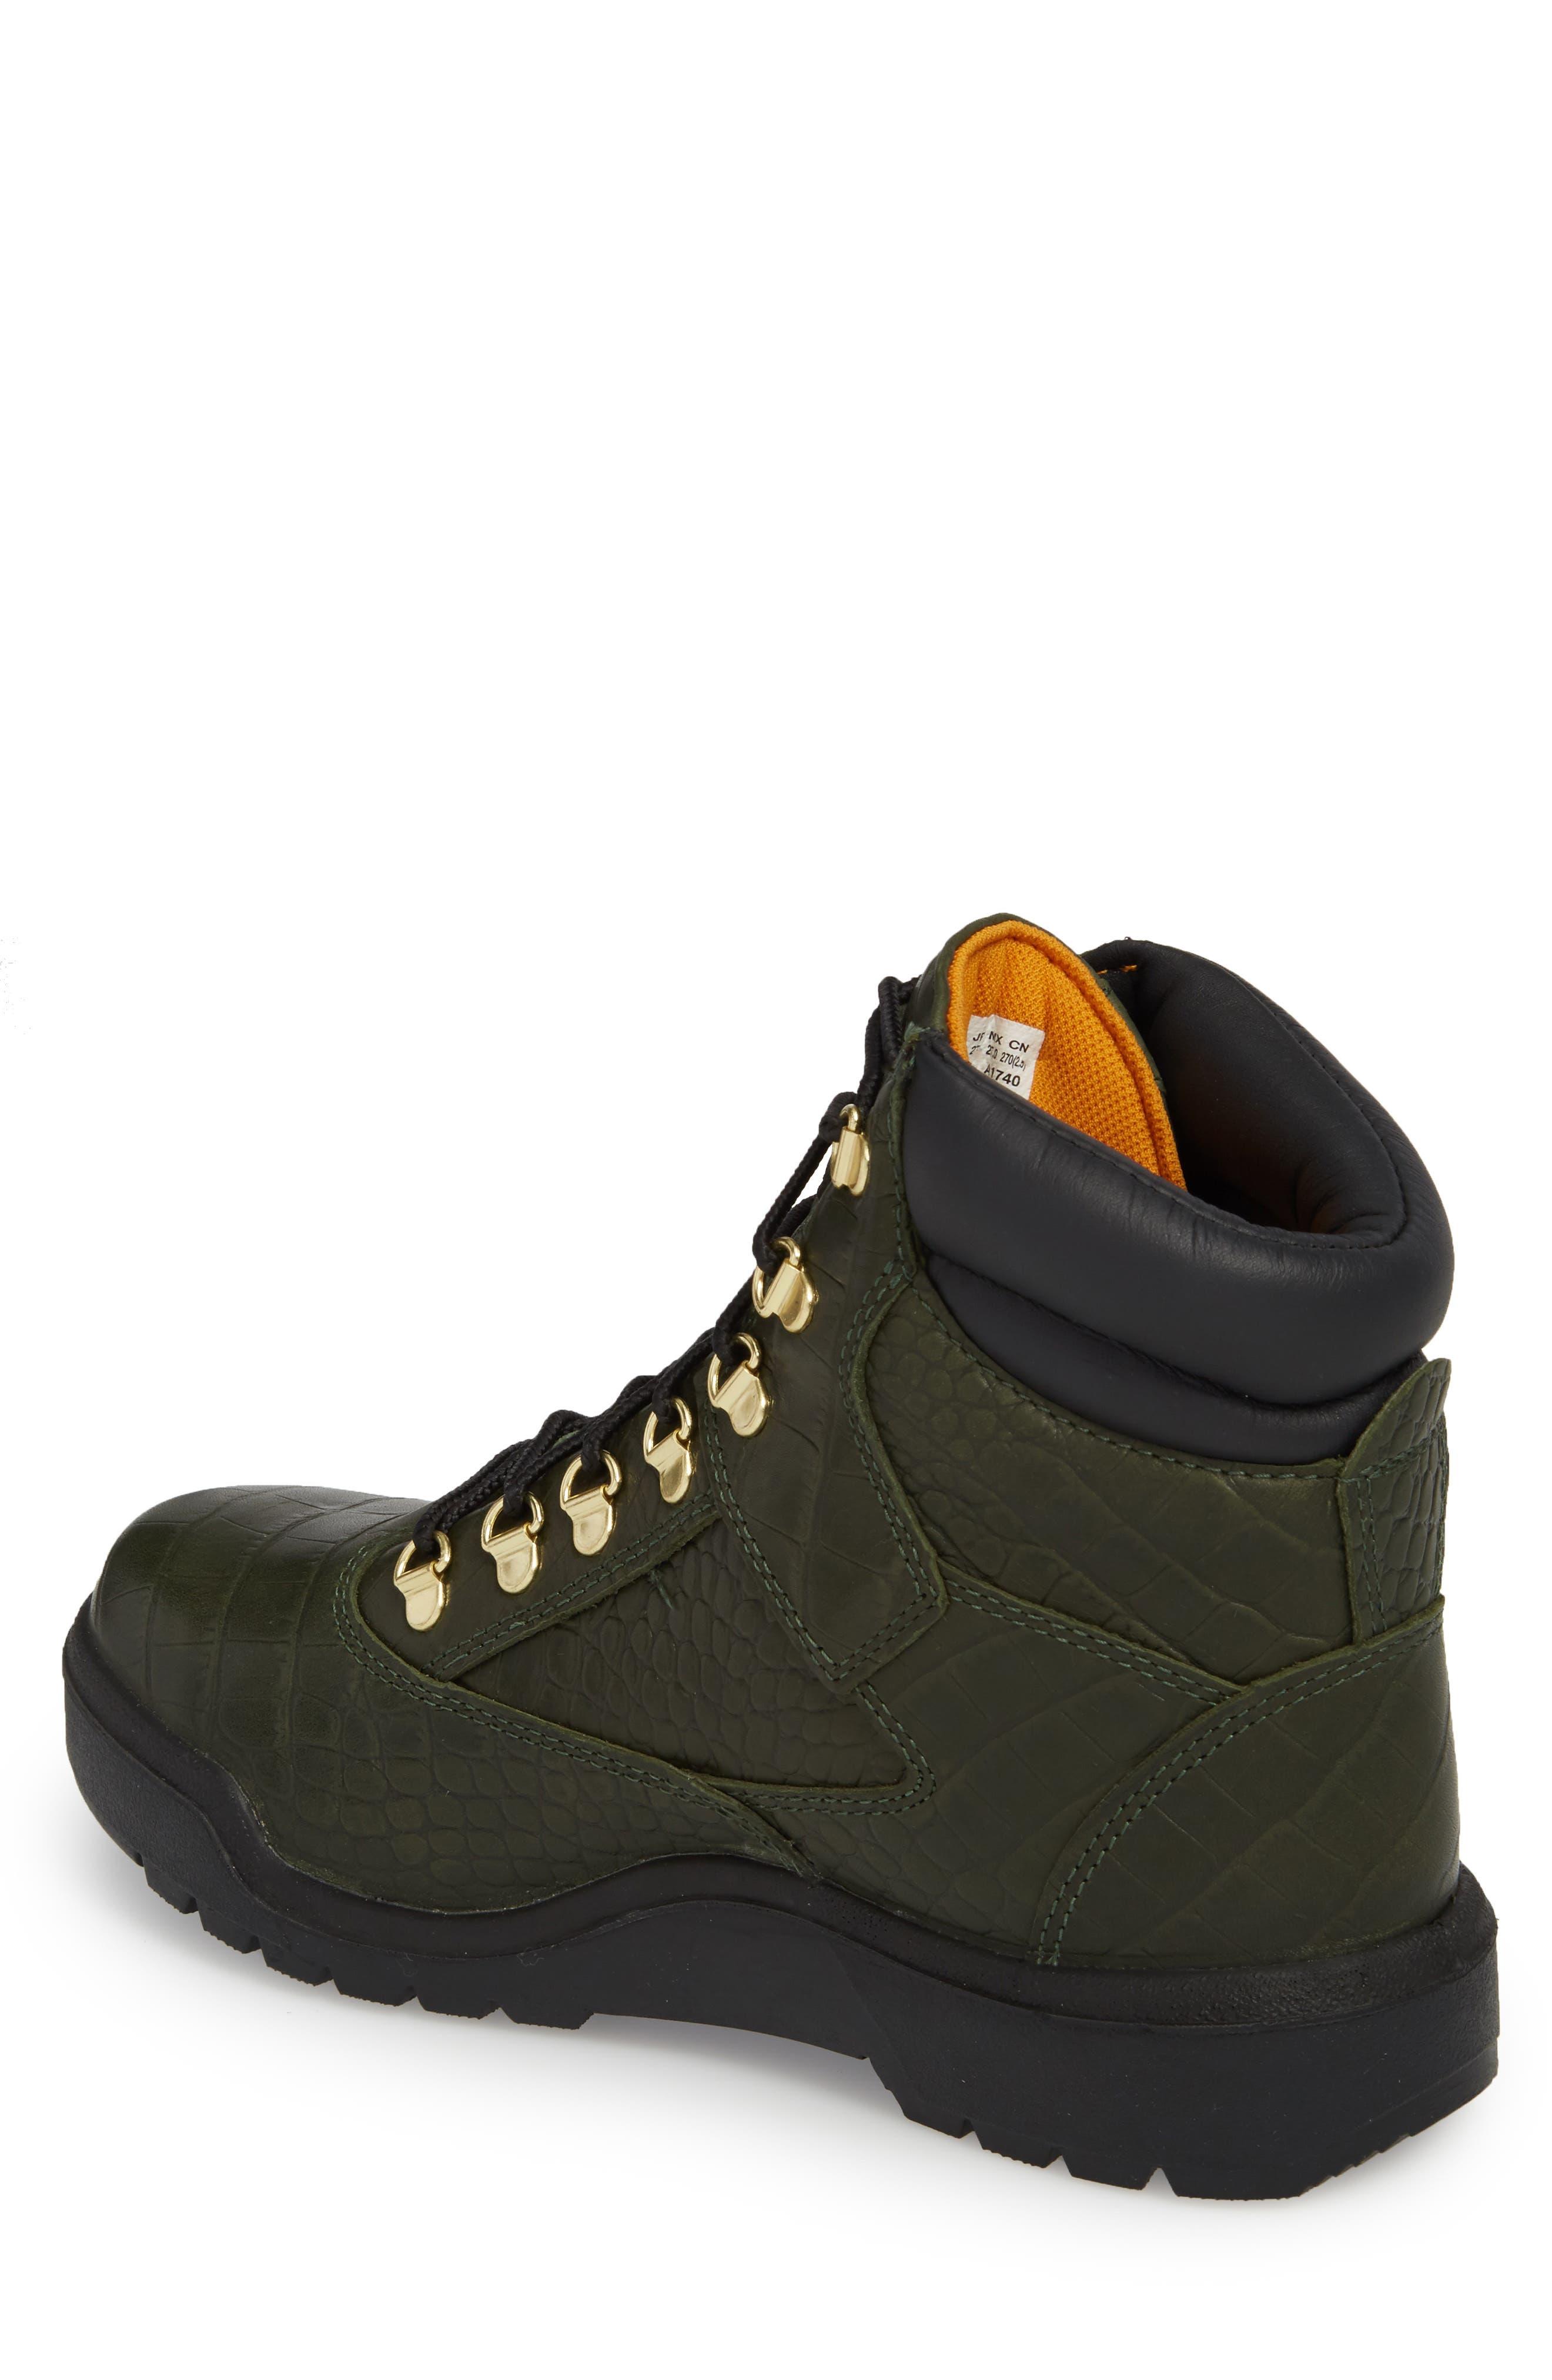 Field Waterproof Boot,                             Alternate thumbnail 2, color,                             Green/ Cardinal Exotic